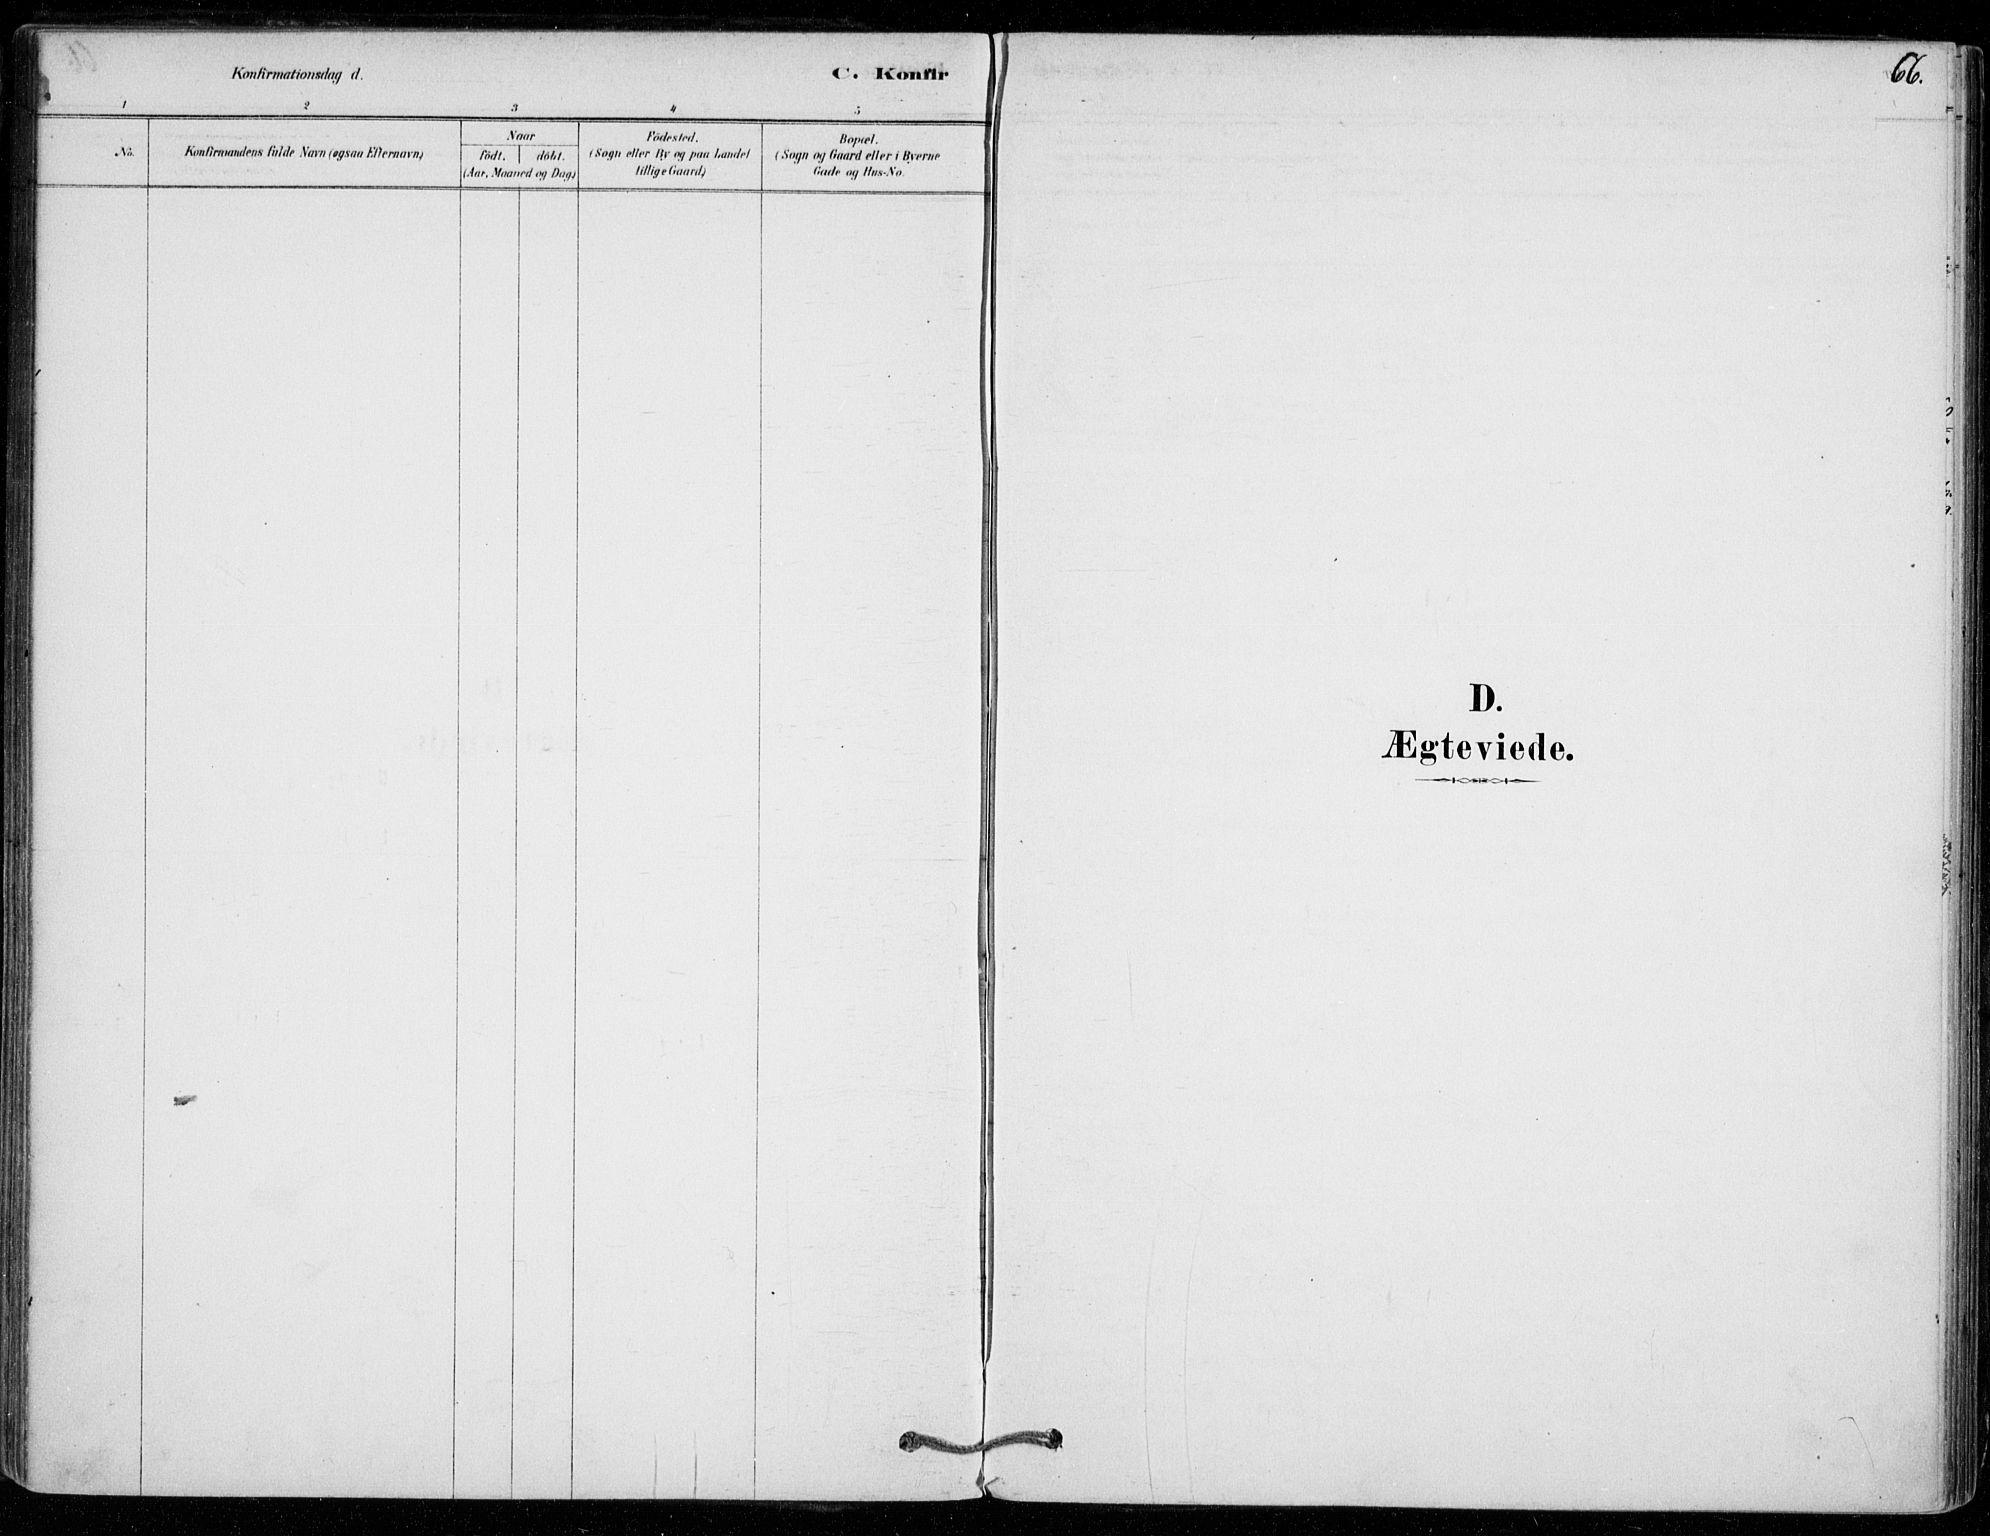 SAO, Vestby prestekontor Kirkebøker, F/Fe/L0001: Ministerialbok nr. V 1, 1878-1931, s. 66